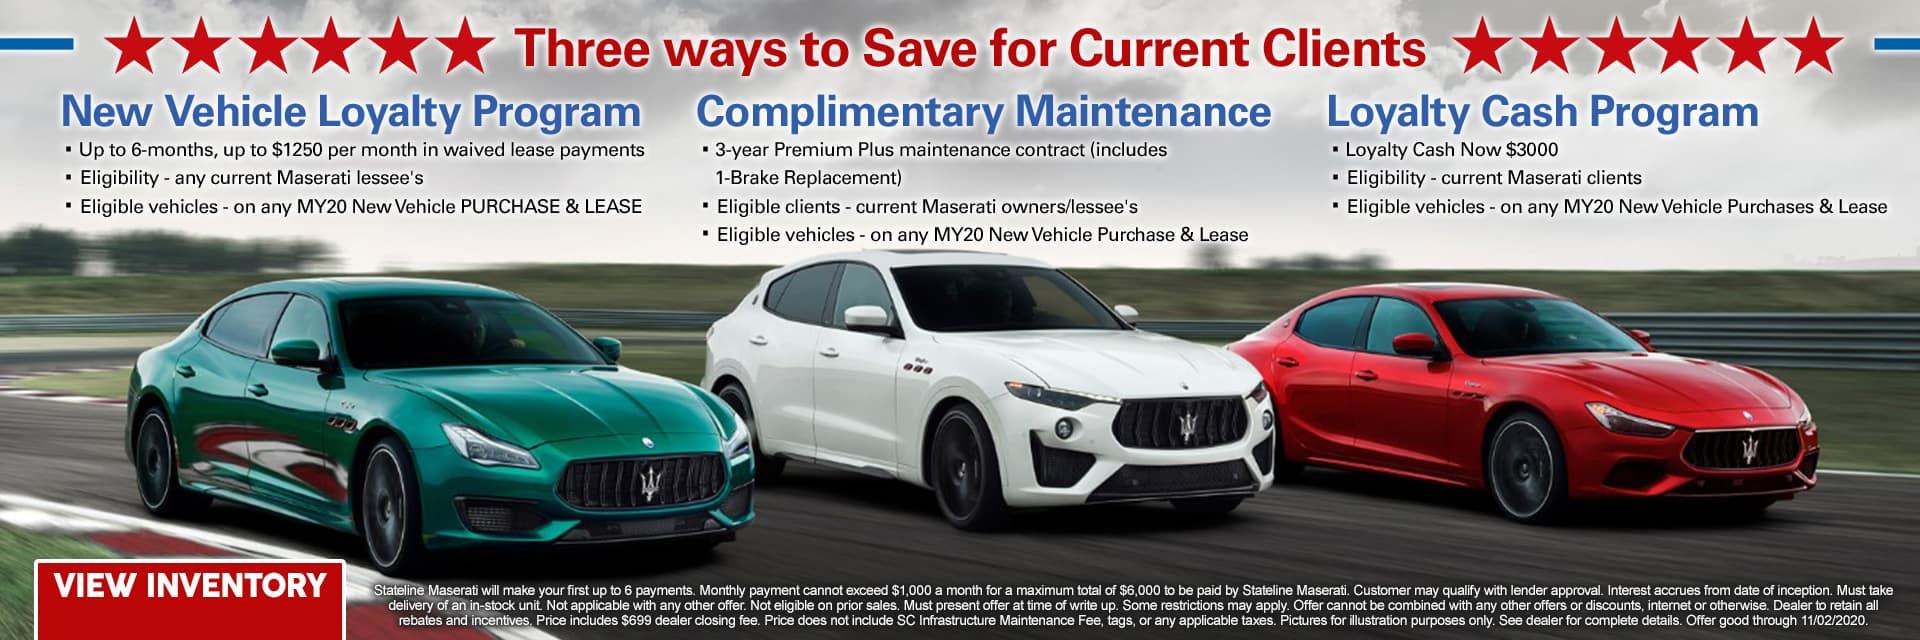 SLAM80451-02-October-2020-Web-Campaign-Maserati-slide-save